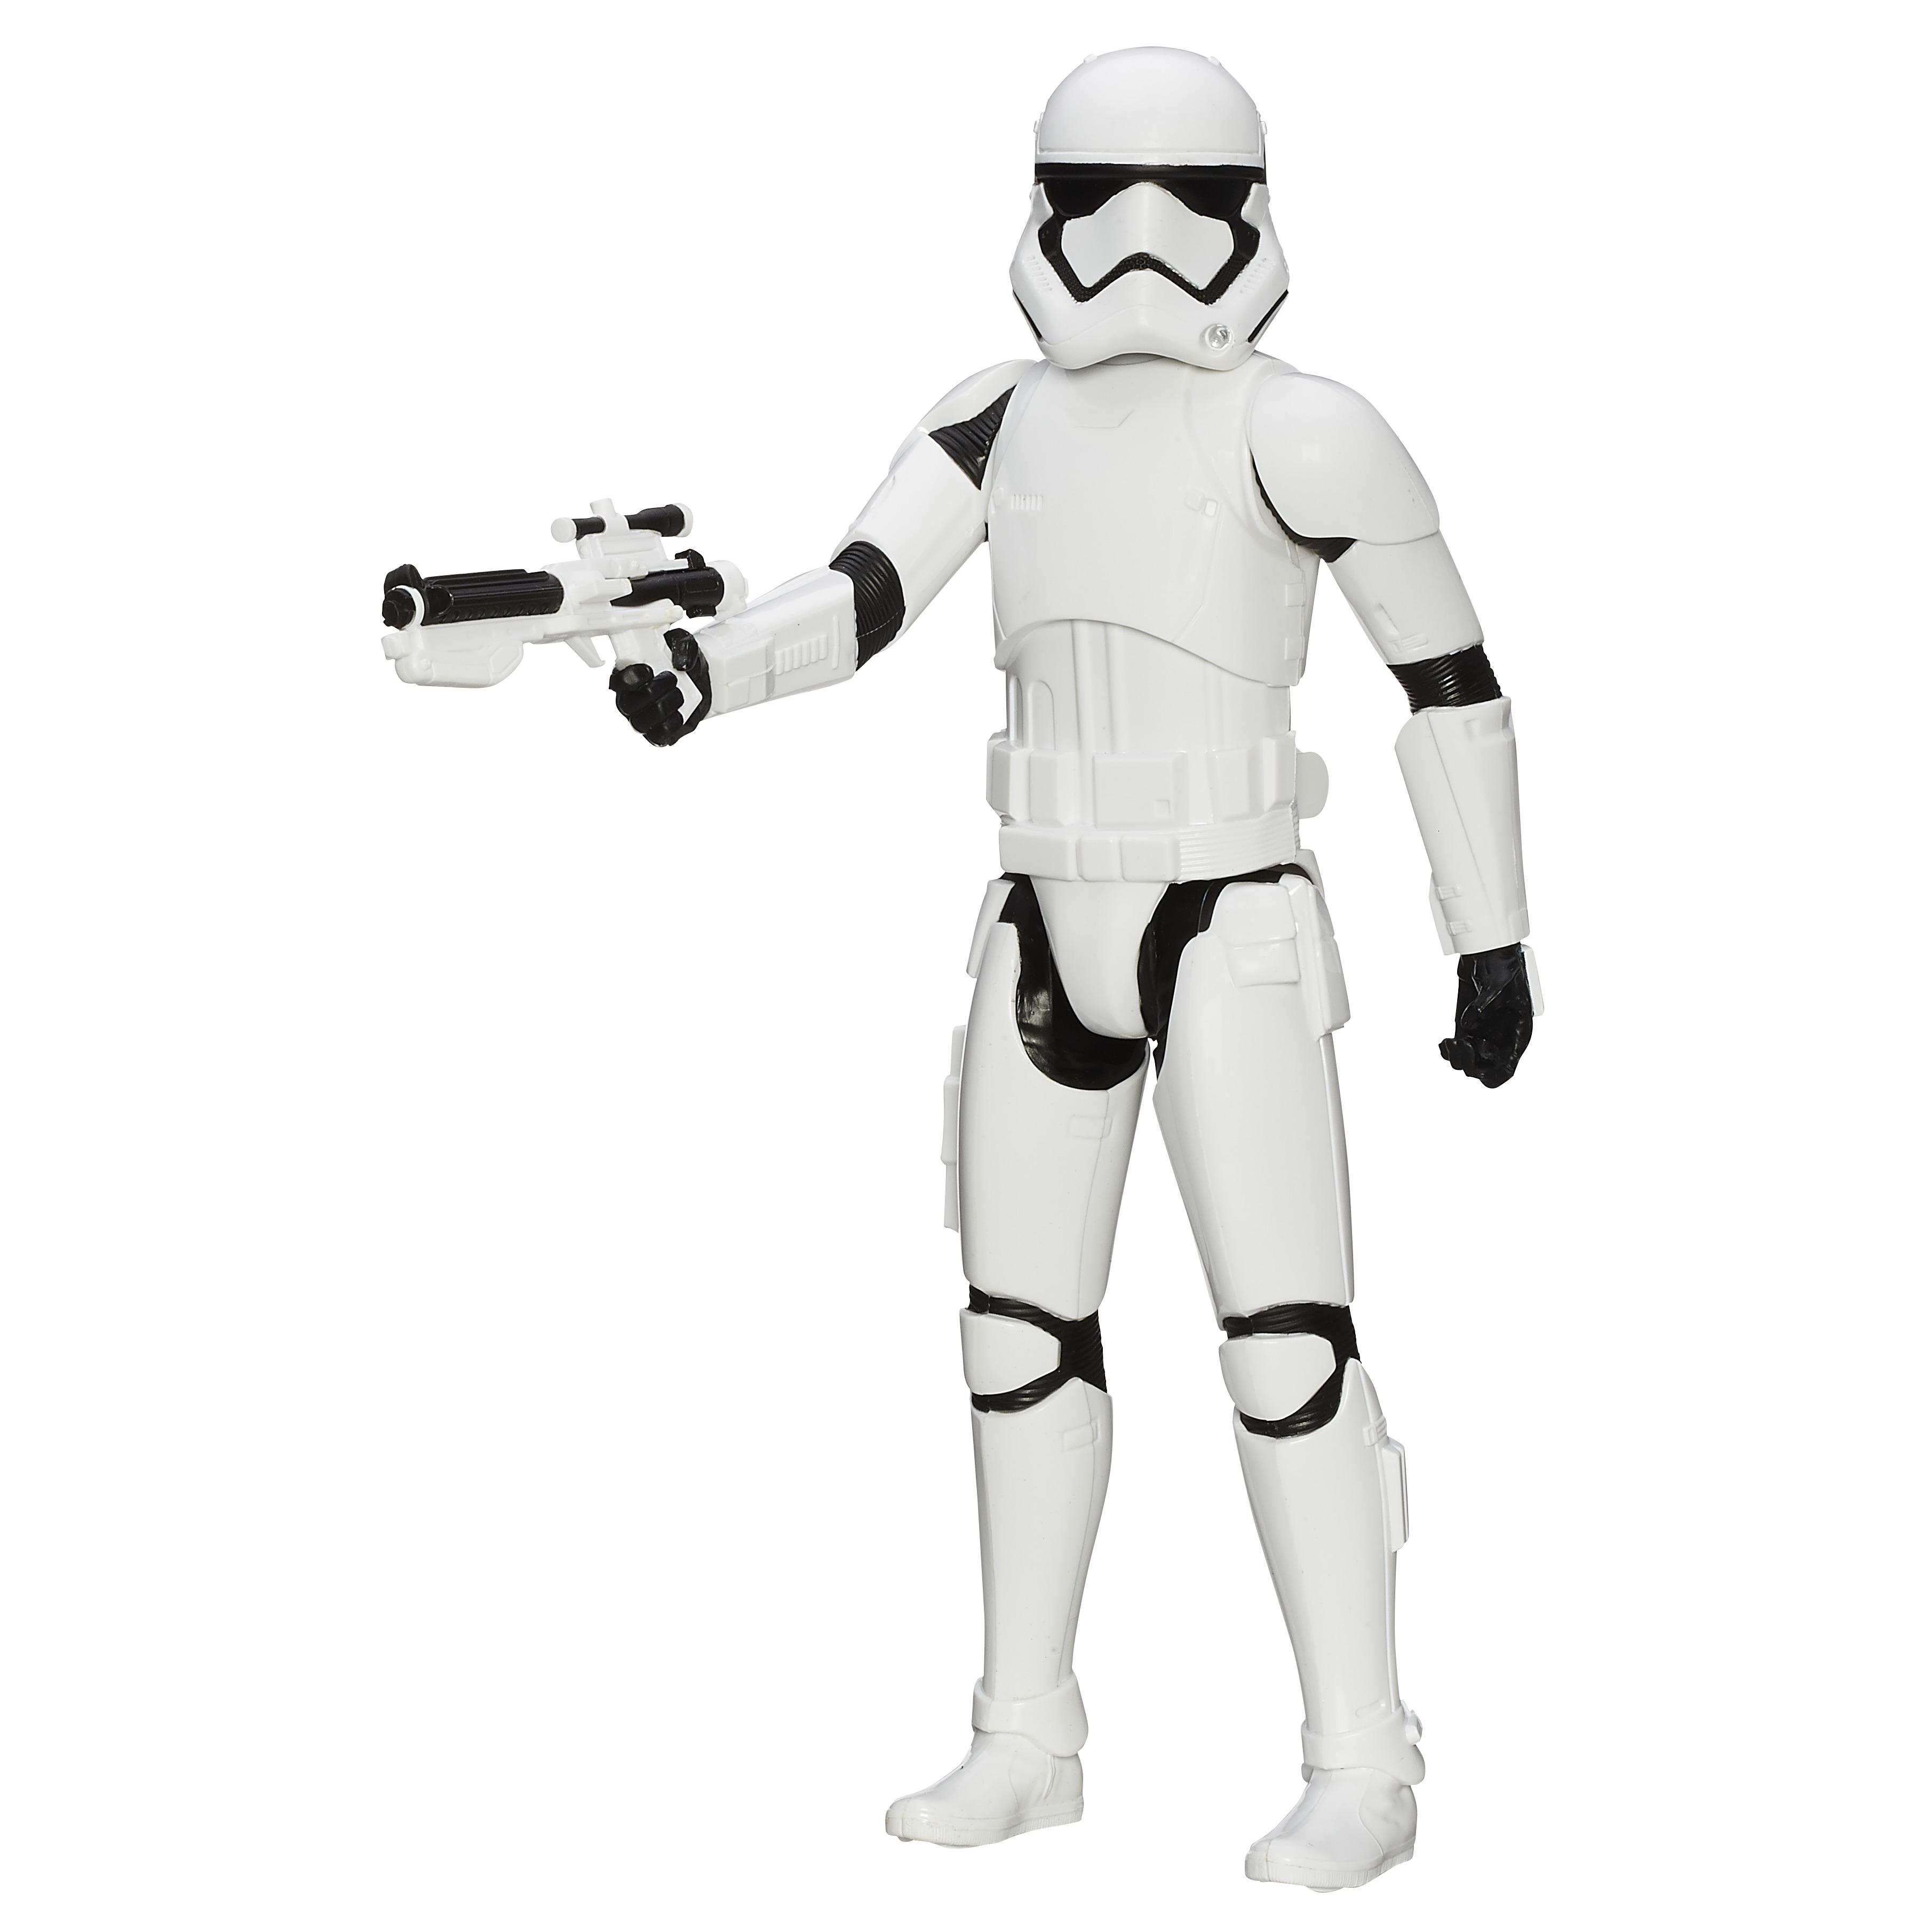 "<b>Star Wars <i>The Force Awakens</i></b>; 12"" Stormtrooper"